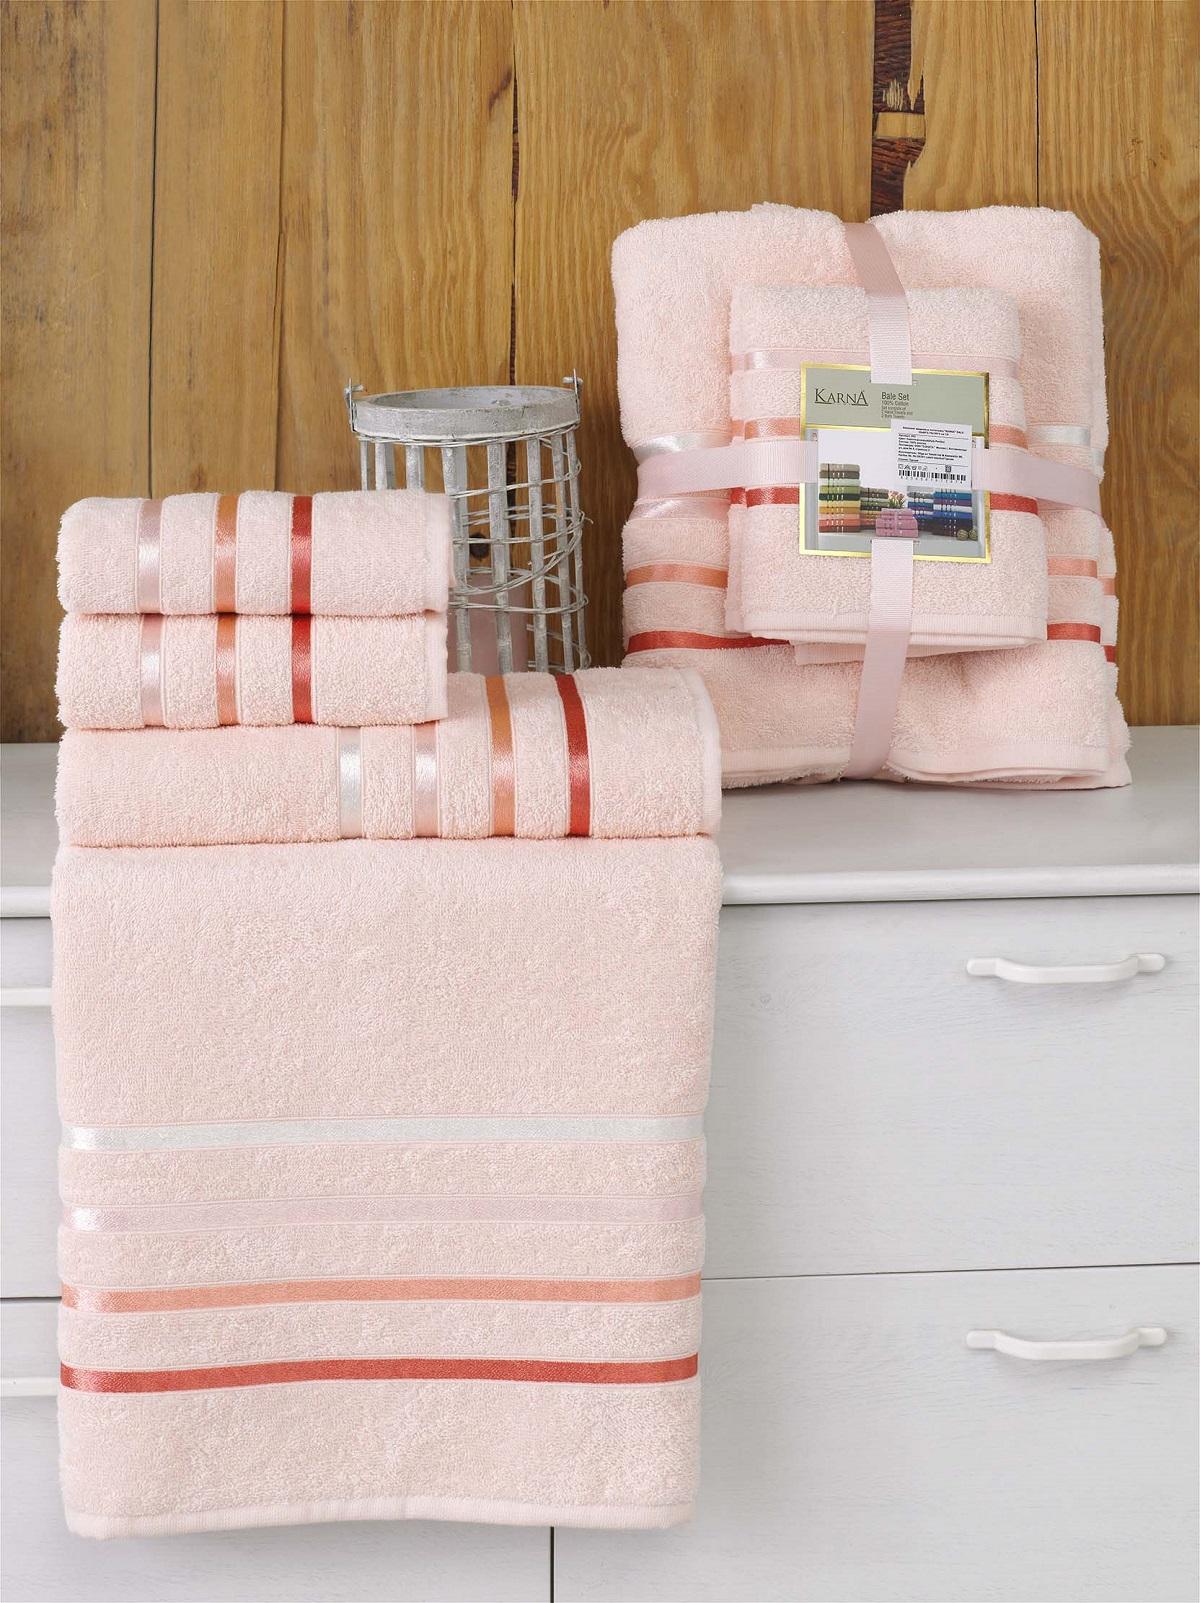 Полотенца Karna Полотенце Bale Цвет: Пудра (Набор) полотенца karna полотенце bale цвет розовый набор